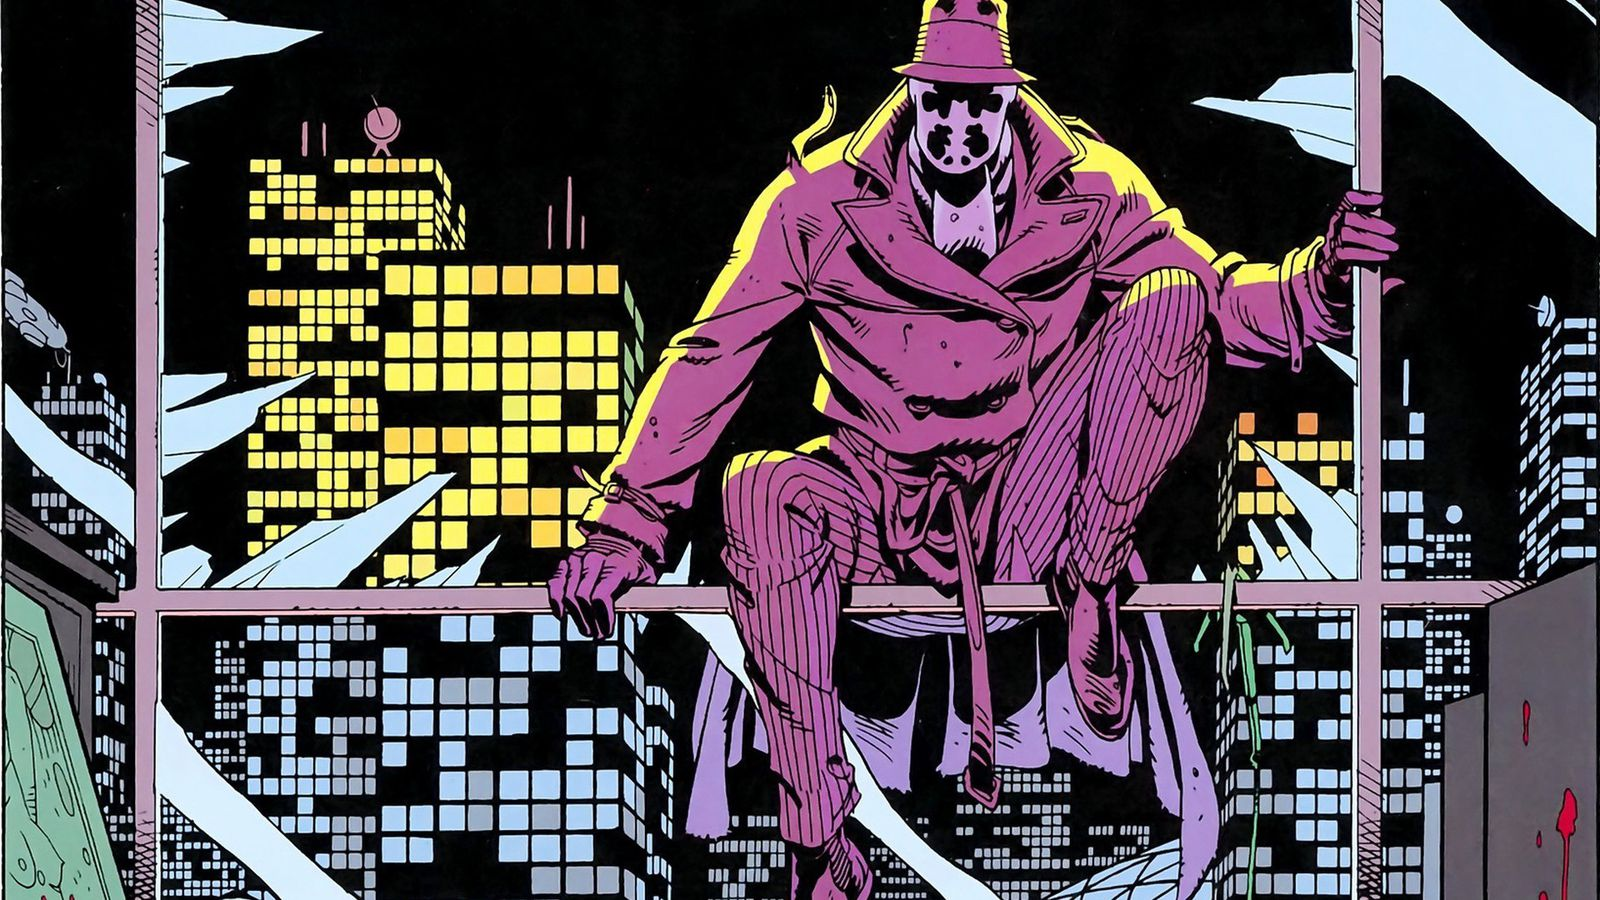 Superman Hd Wallpaper Dear Ted Cruz Rorschach Is Not A Hero Polygon